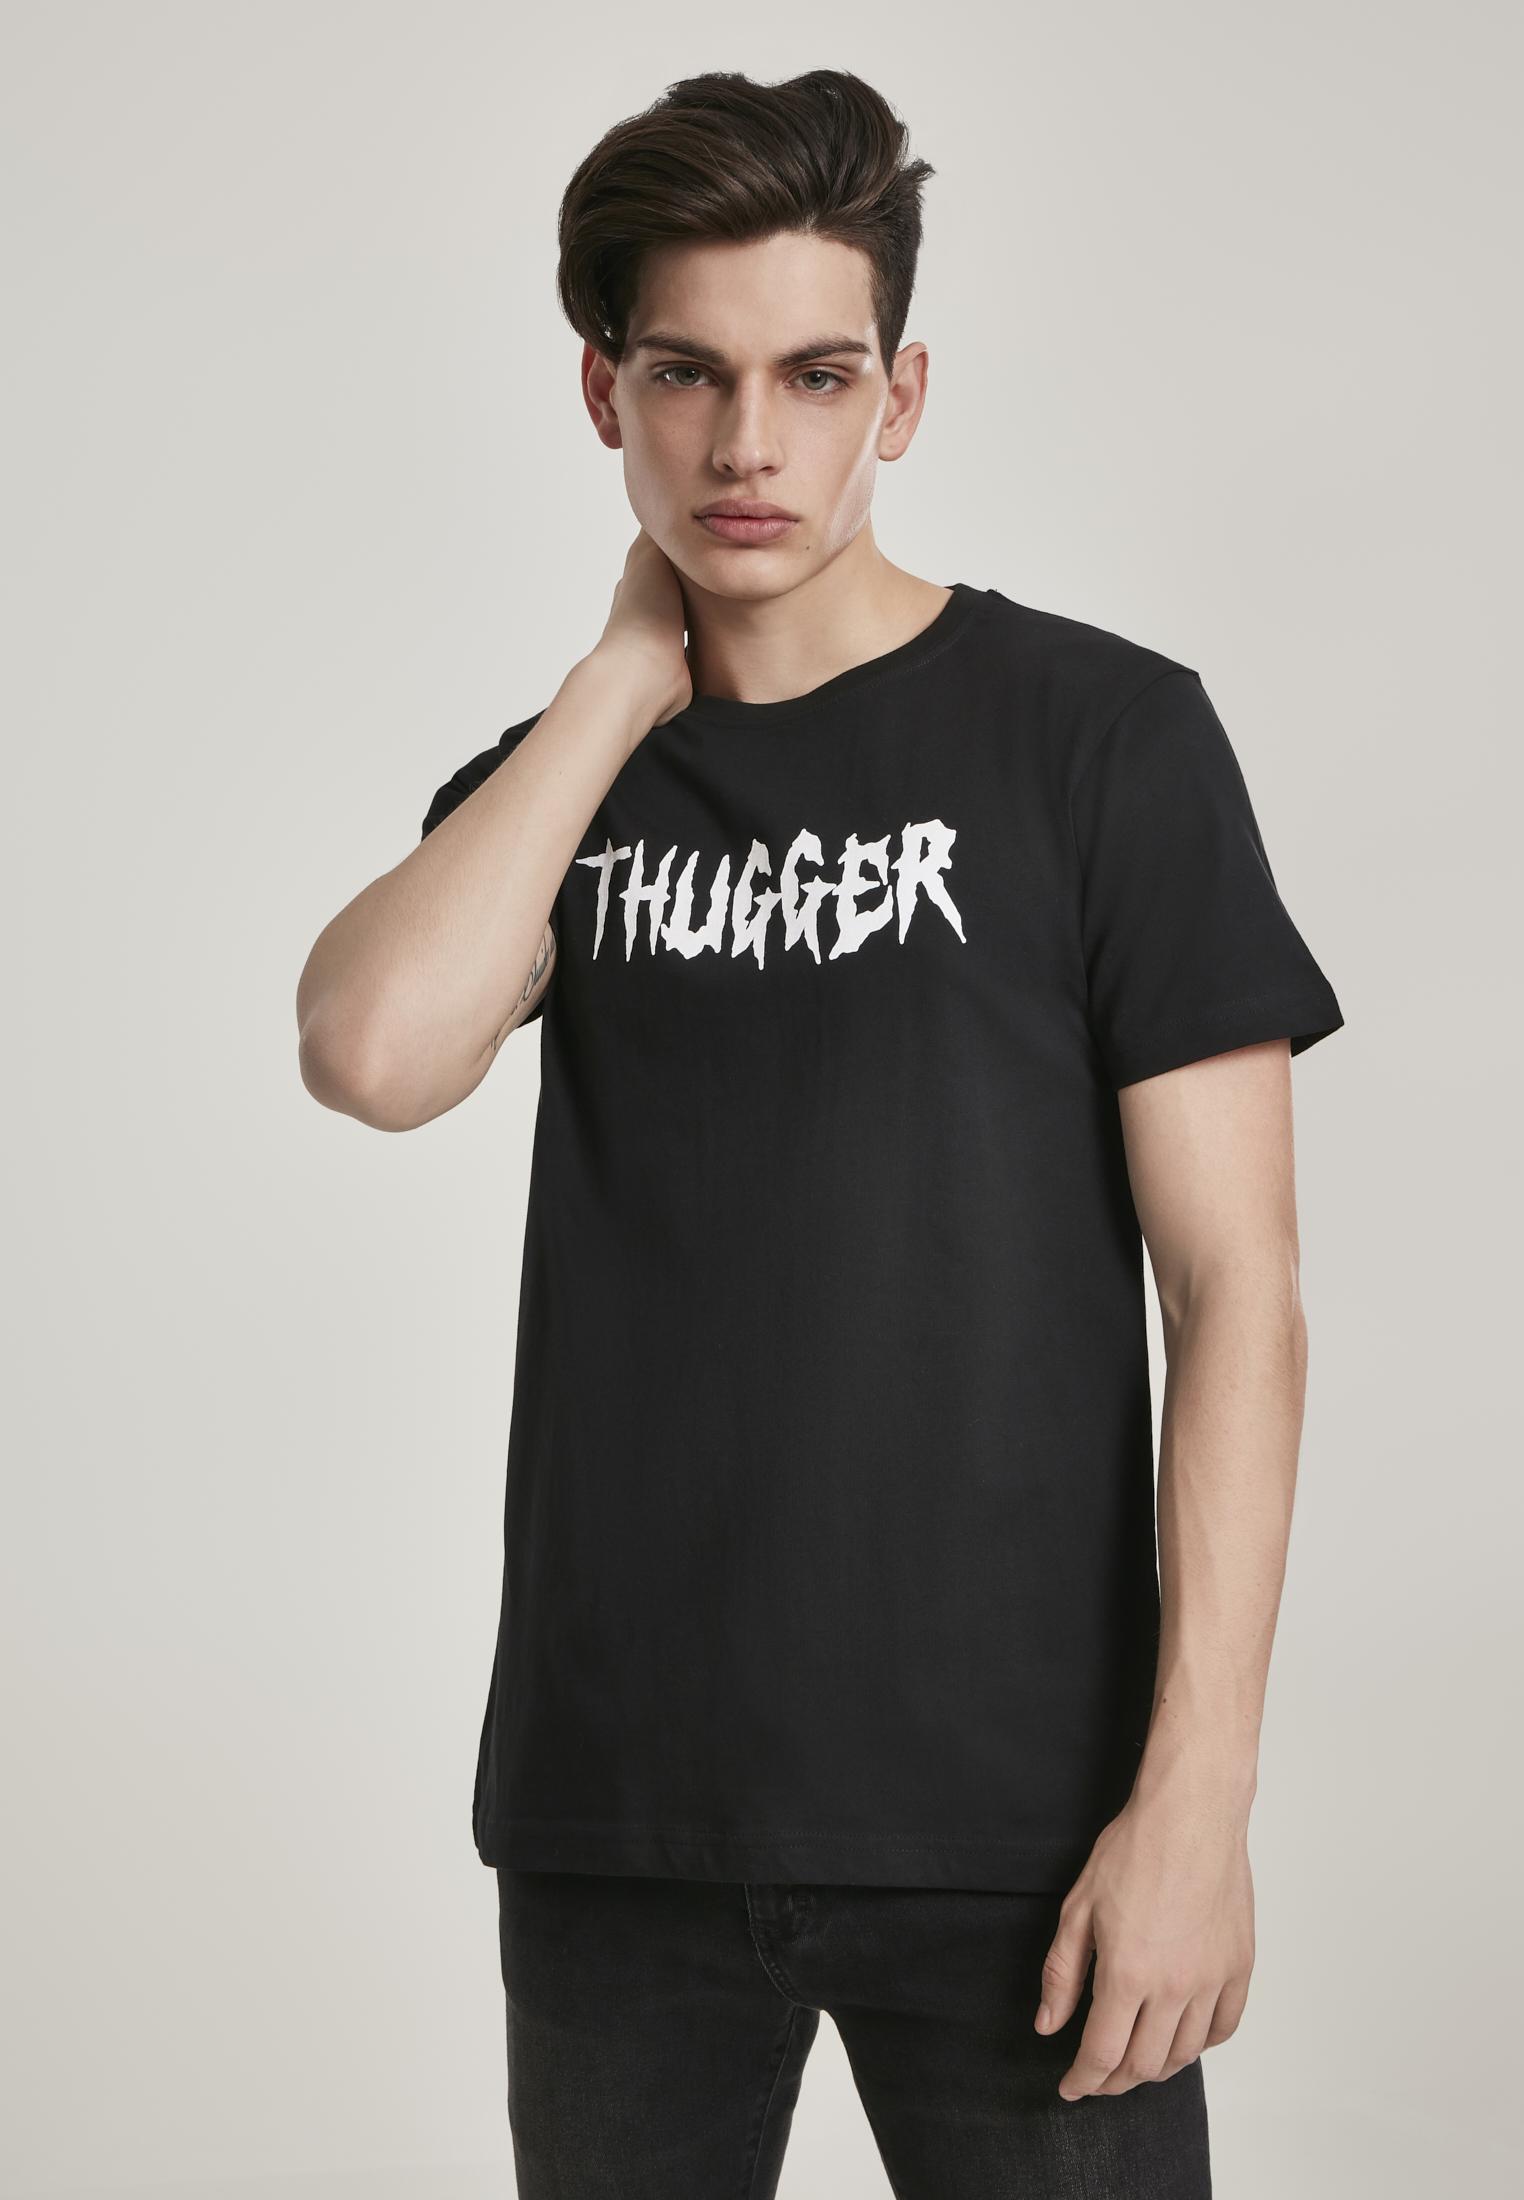 Thugger Childrose Tee MC402